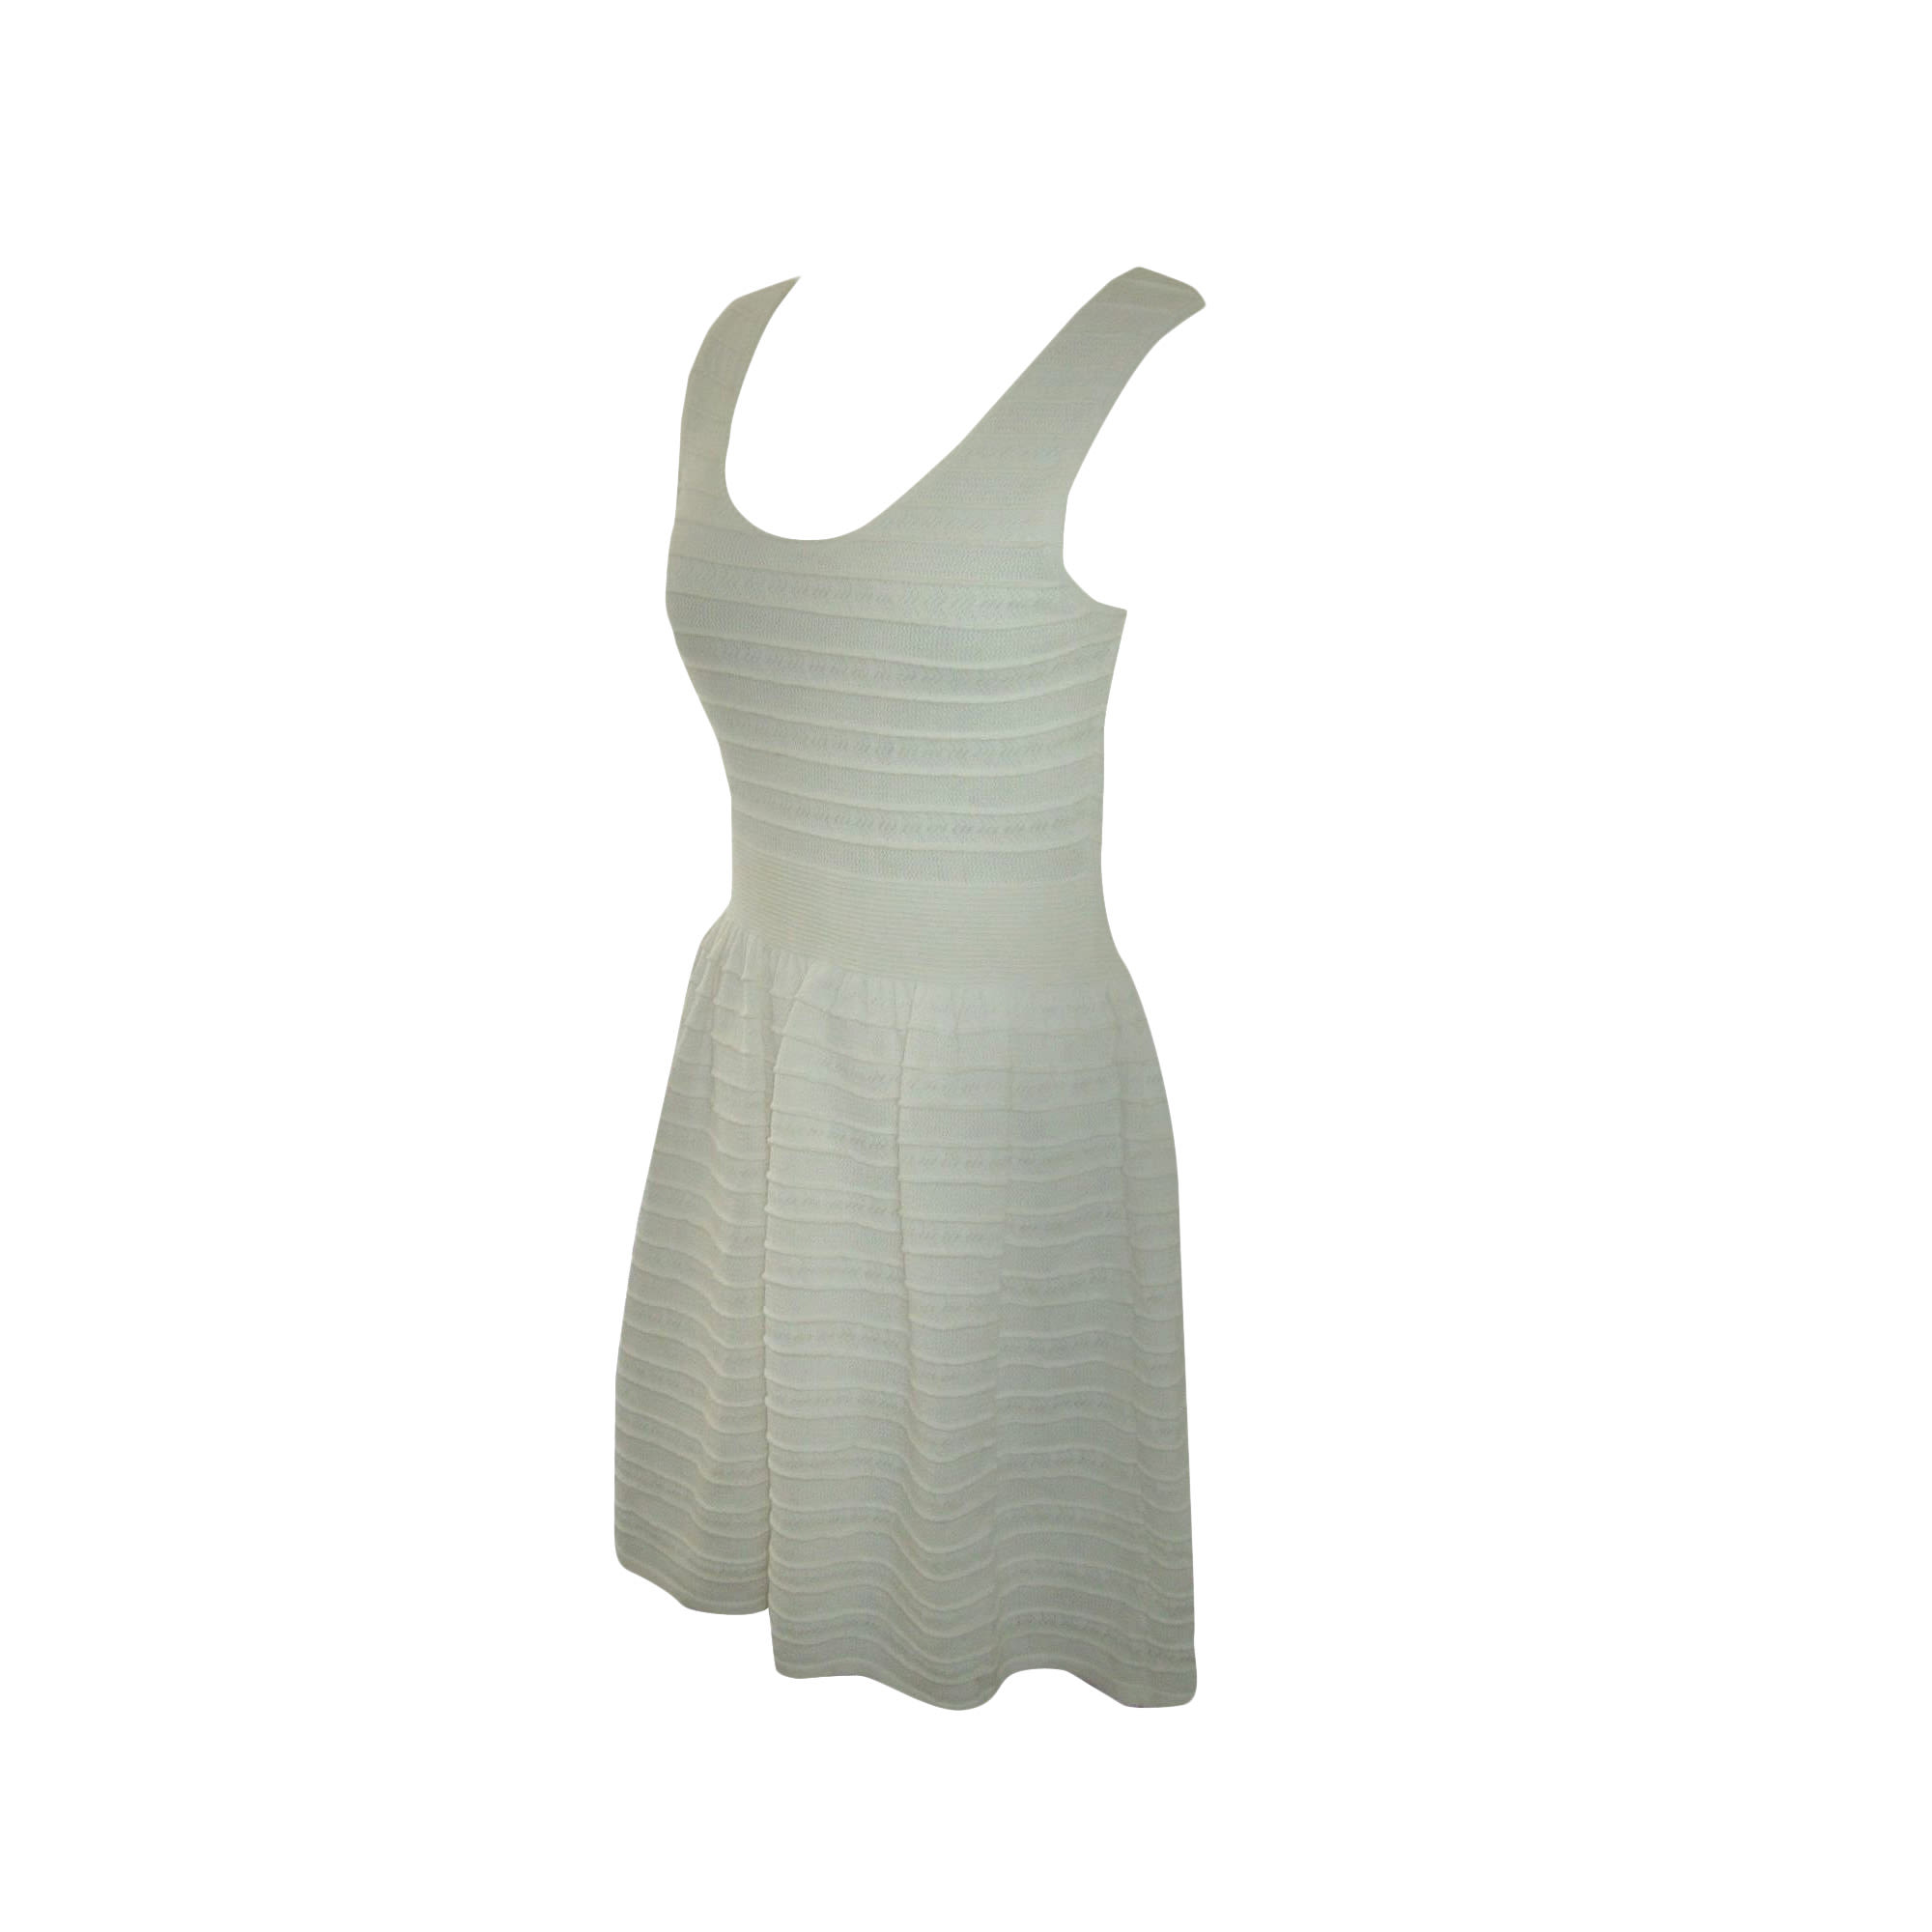 Robe mi-longue CLAUDIE PIERLOT Blanc, blanc cassé, écru